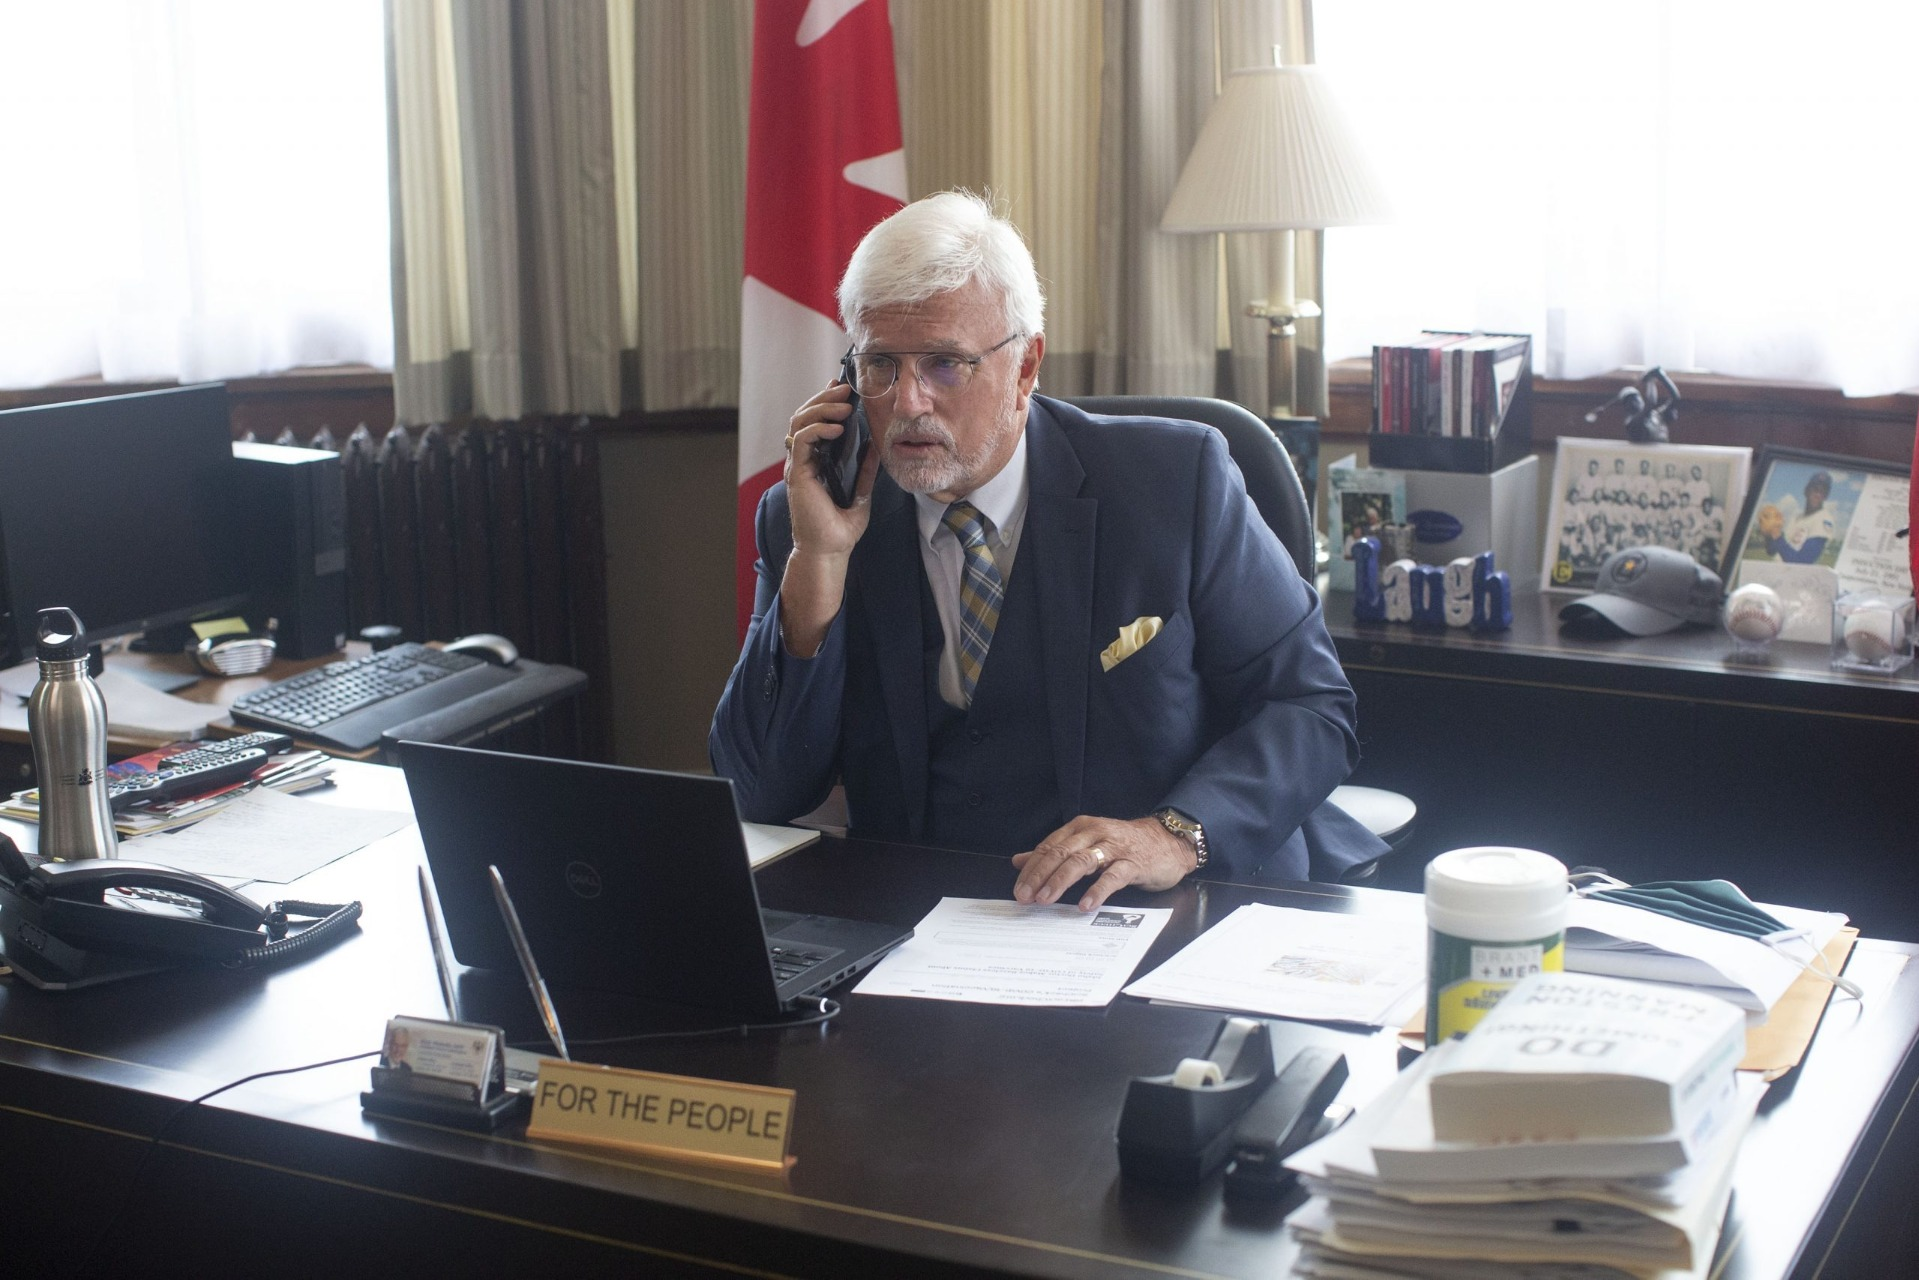 Ontario MPP Rick Nicholls speaks out against vaccine passport